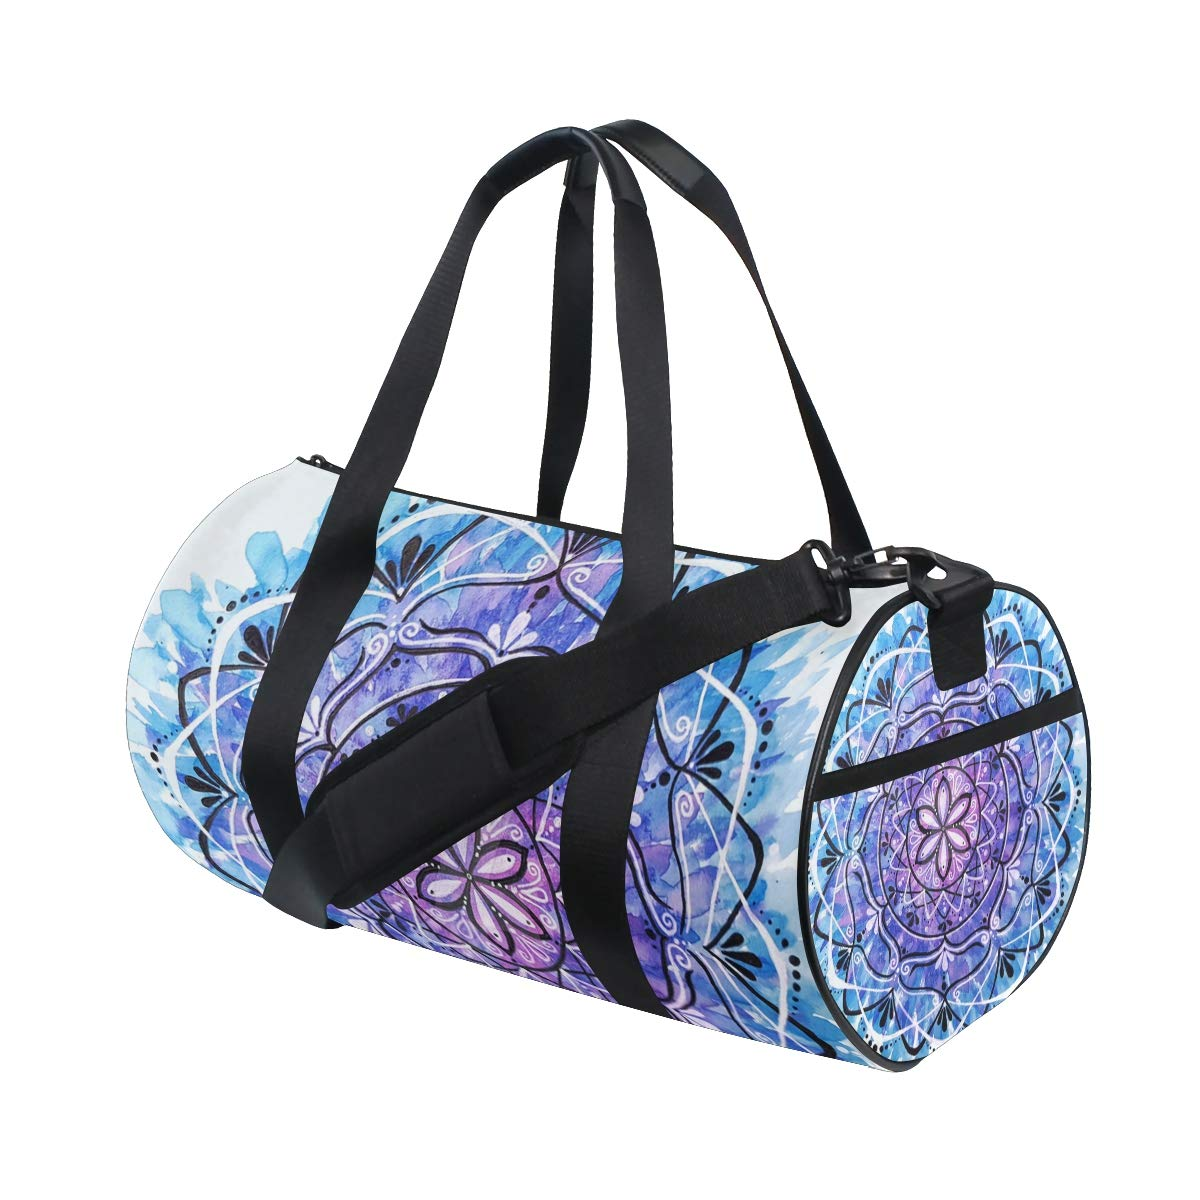 OuLian Duffel Bags Flying American Flag Womens Gym Yoga Bag Small Fun Sports Bag for Men